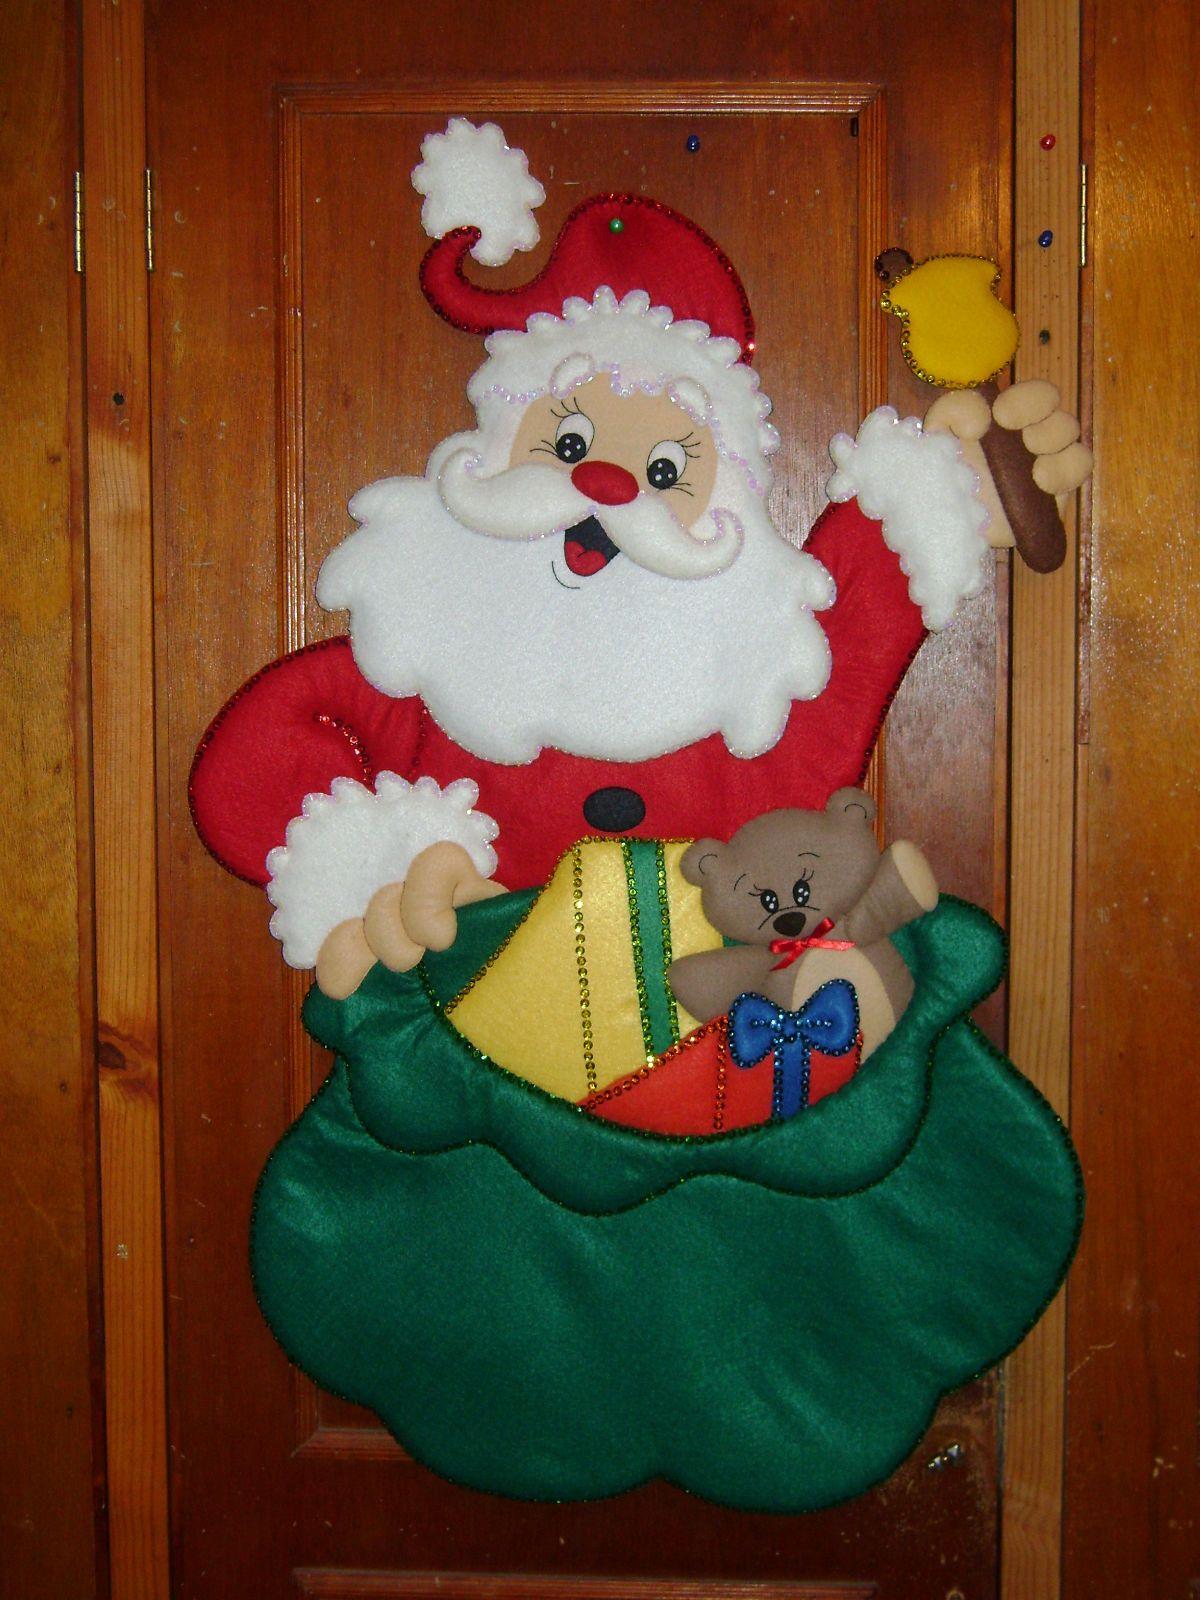 Navidad Papa Noel Pinterest Navidad Manualidades Navidad Y - Manualidades-navideas-papa-noel